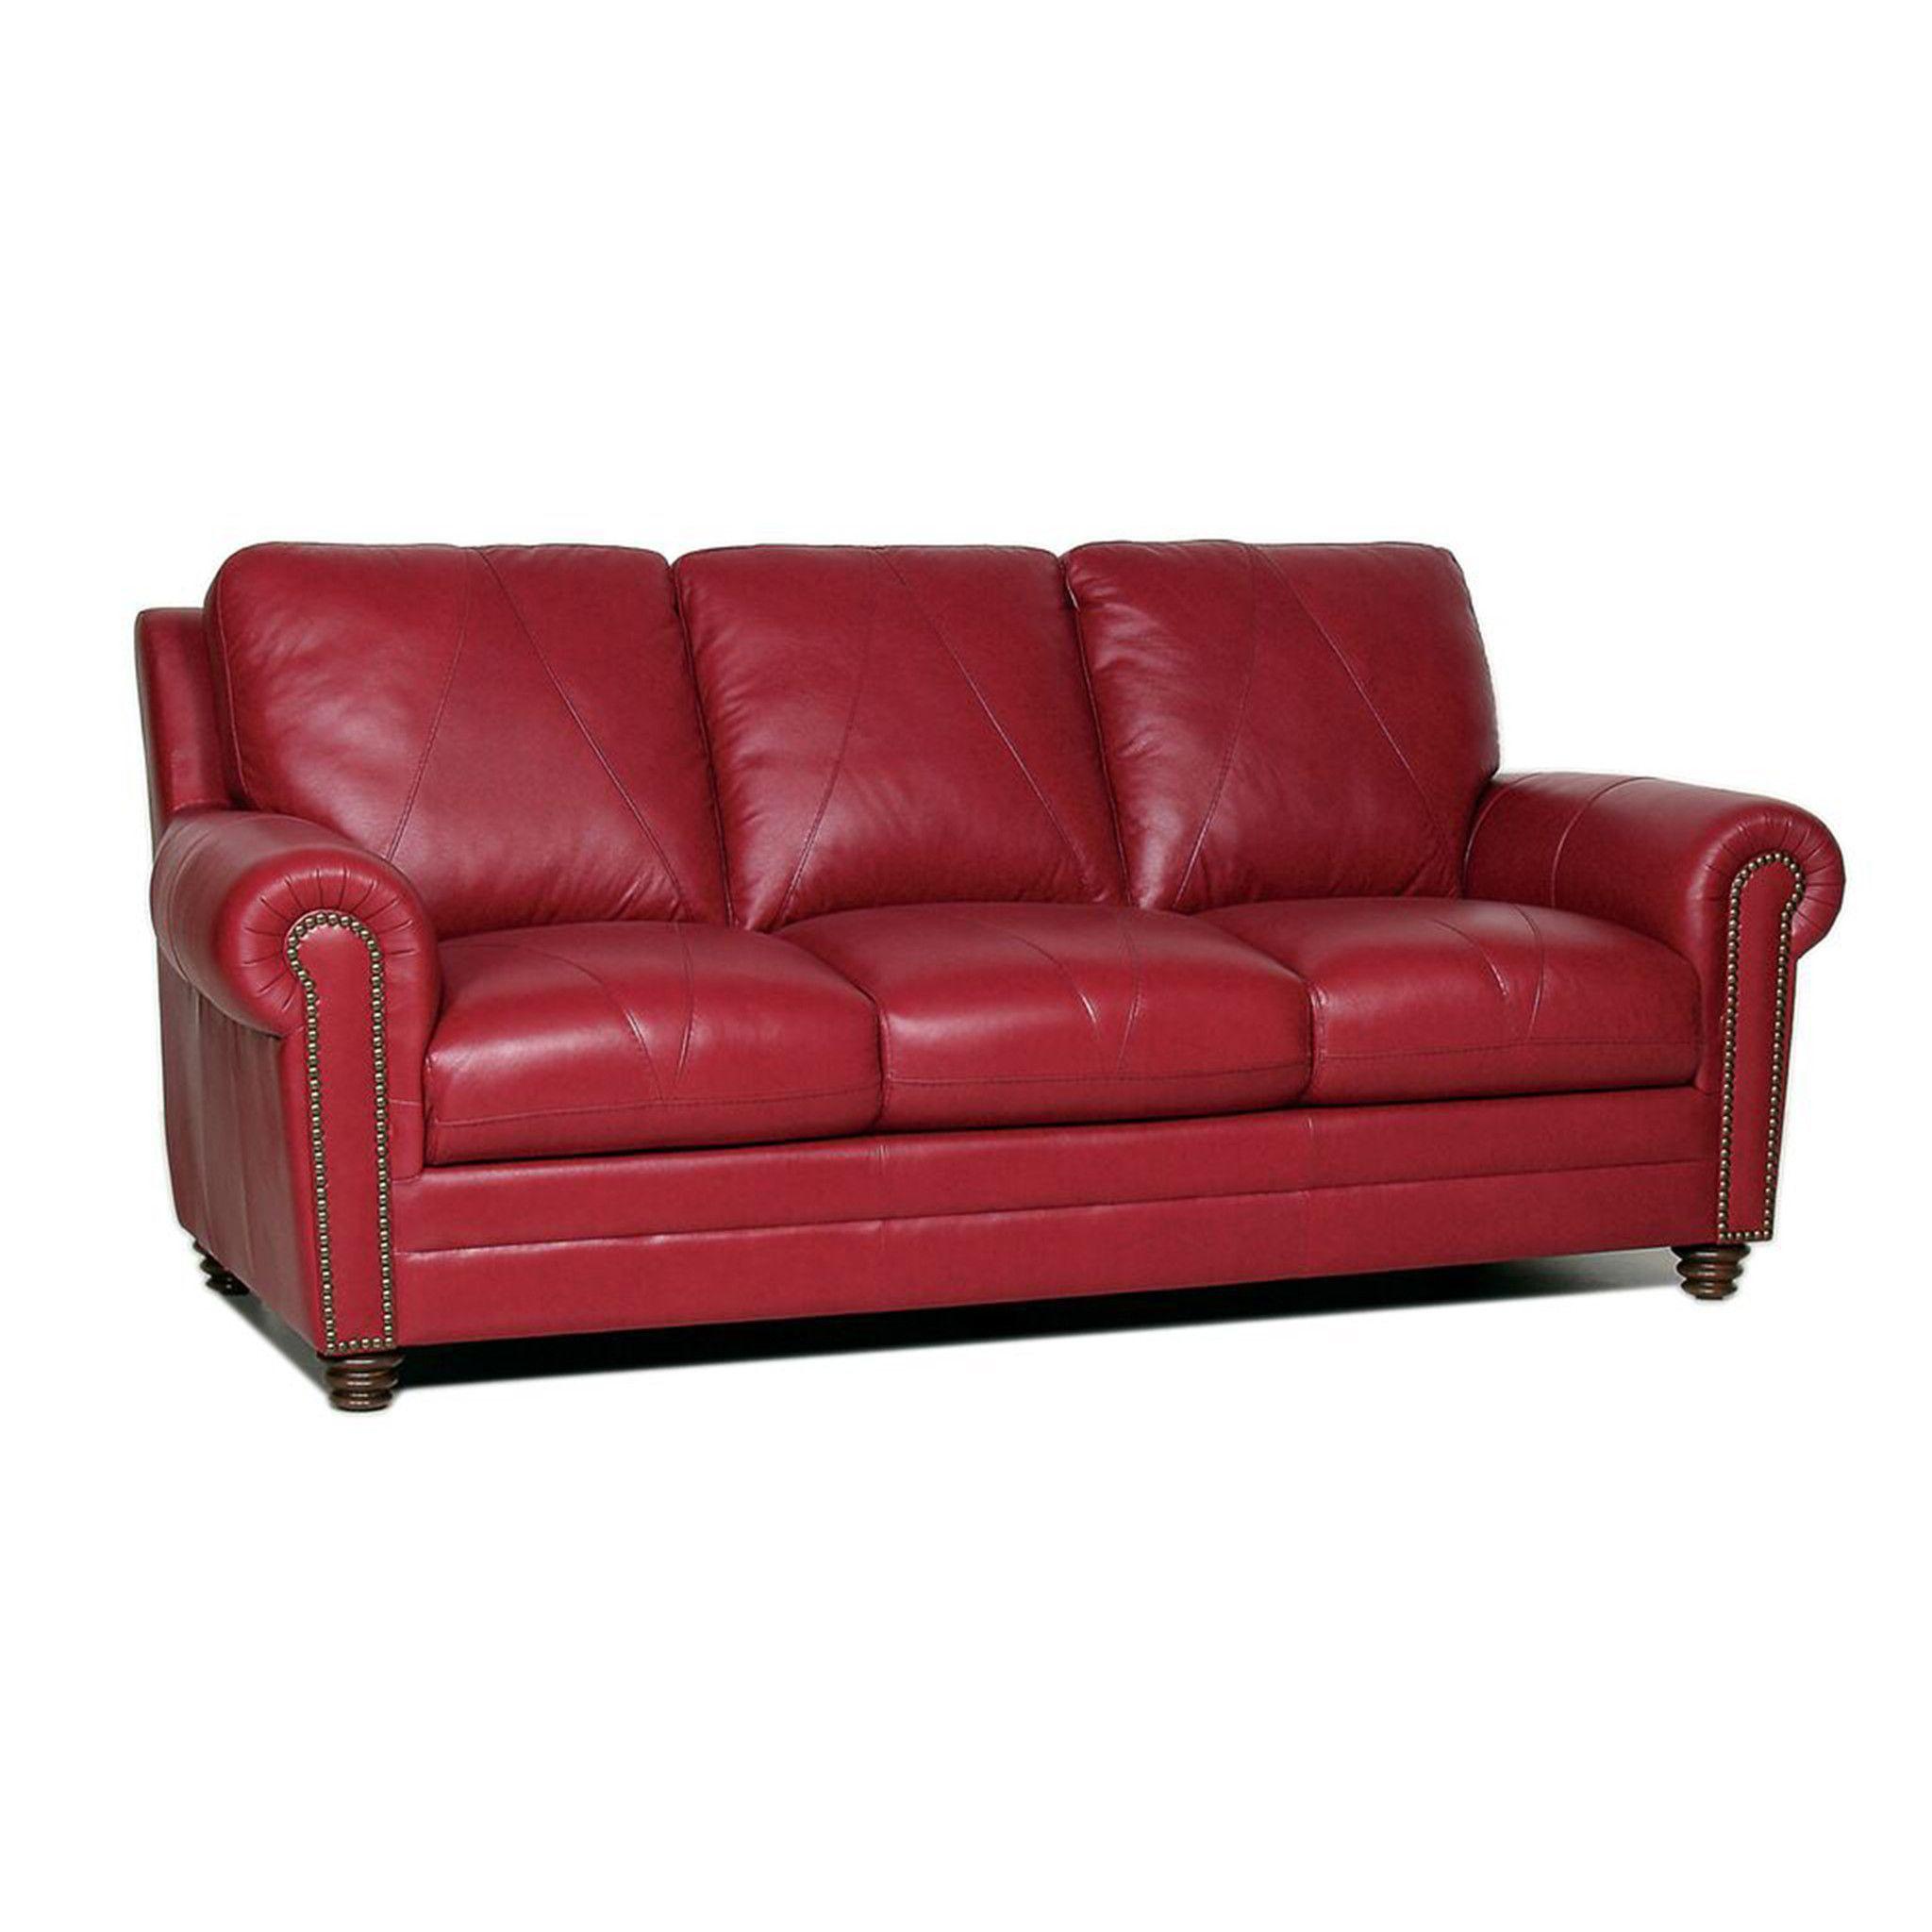 Philadelphia Berkline Reclining Dark Red Leather Sofa Set $775